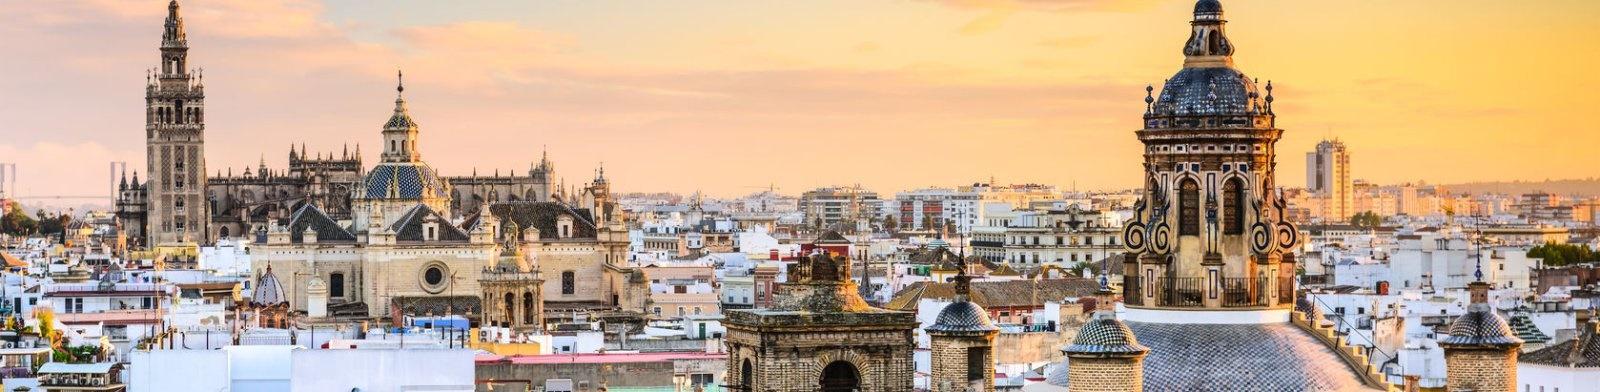 Seville, Main Image